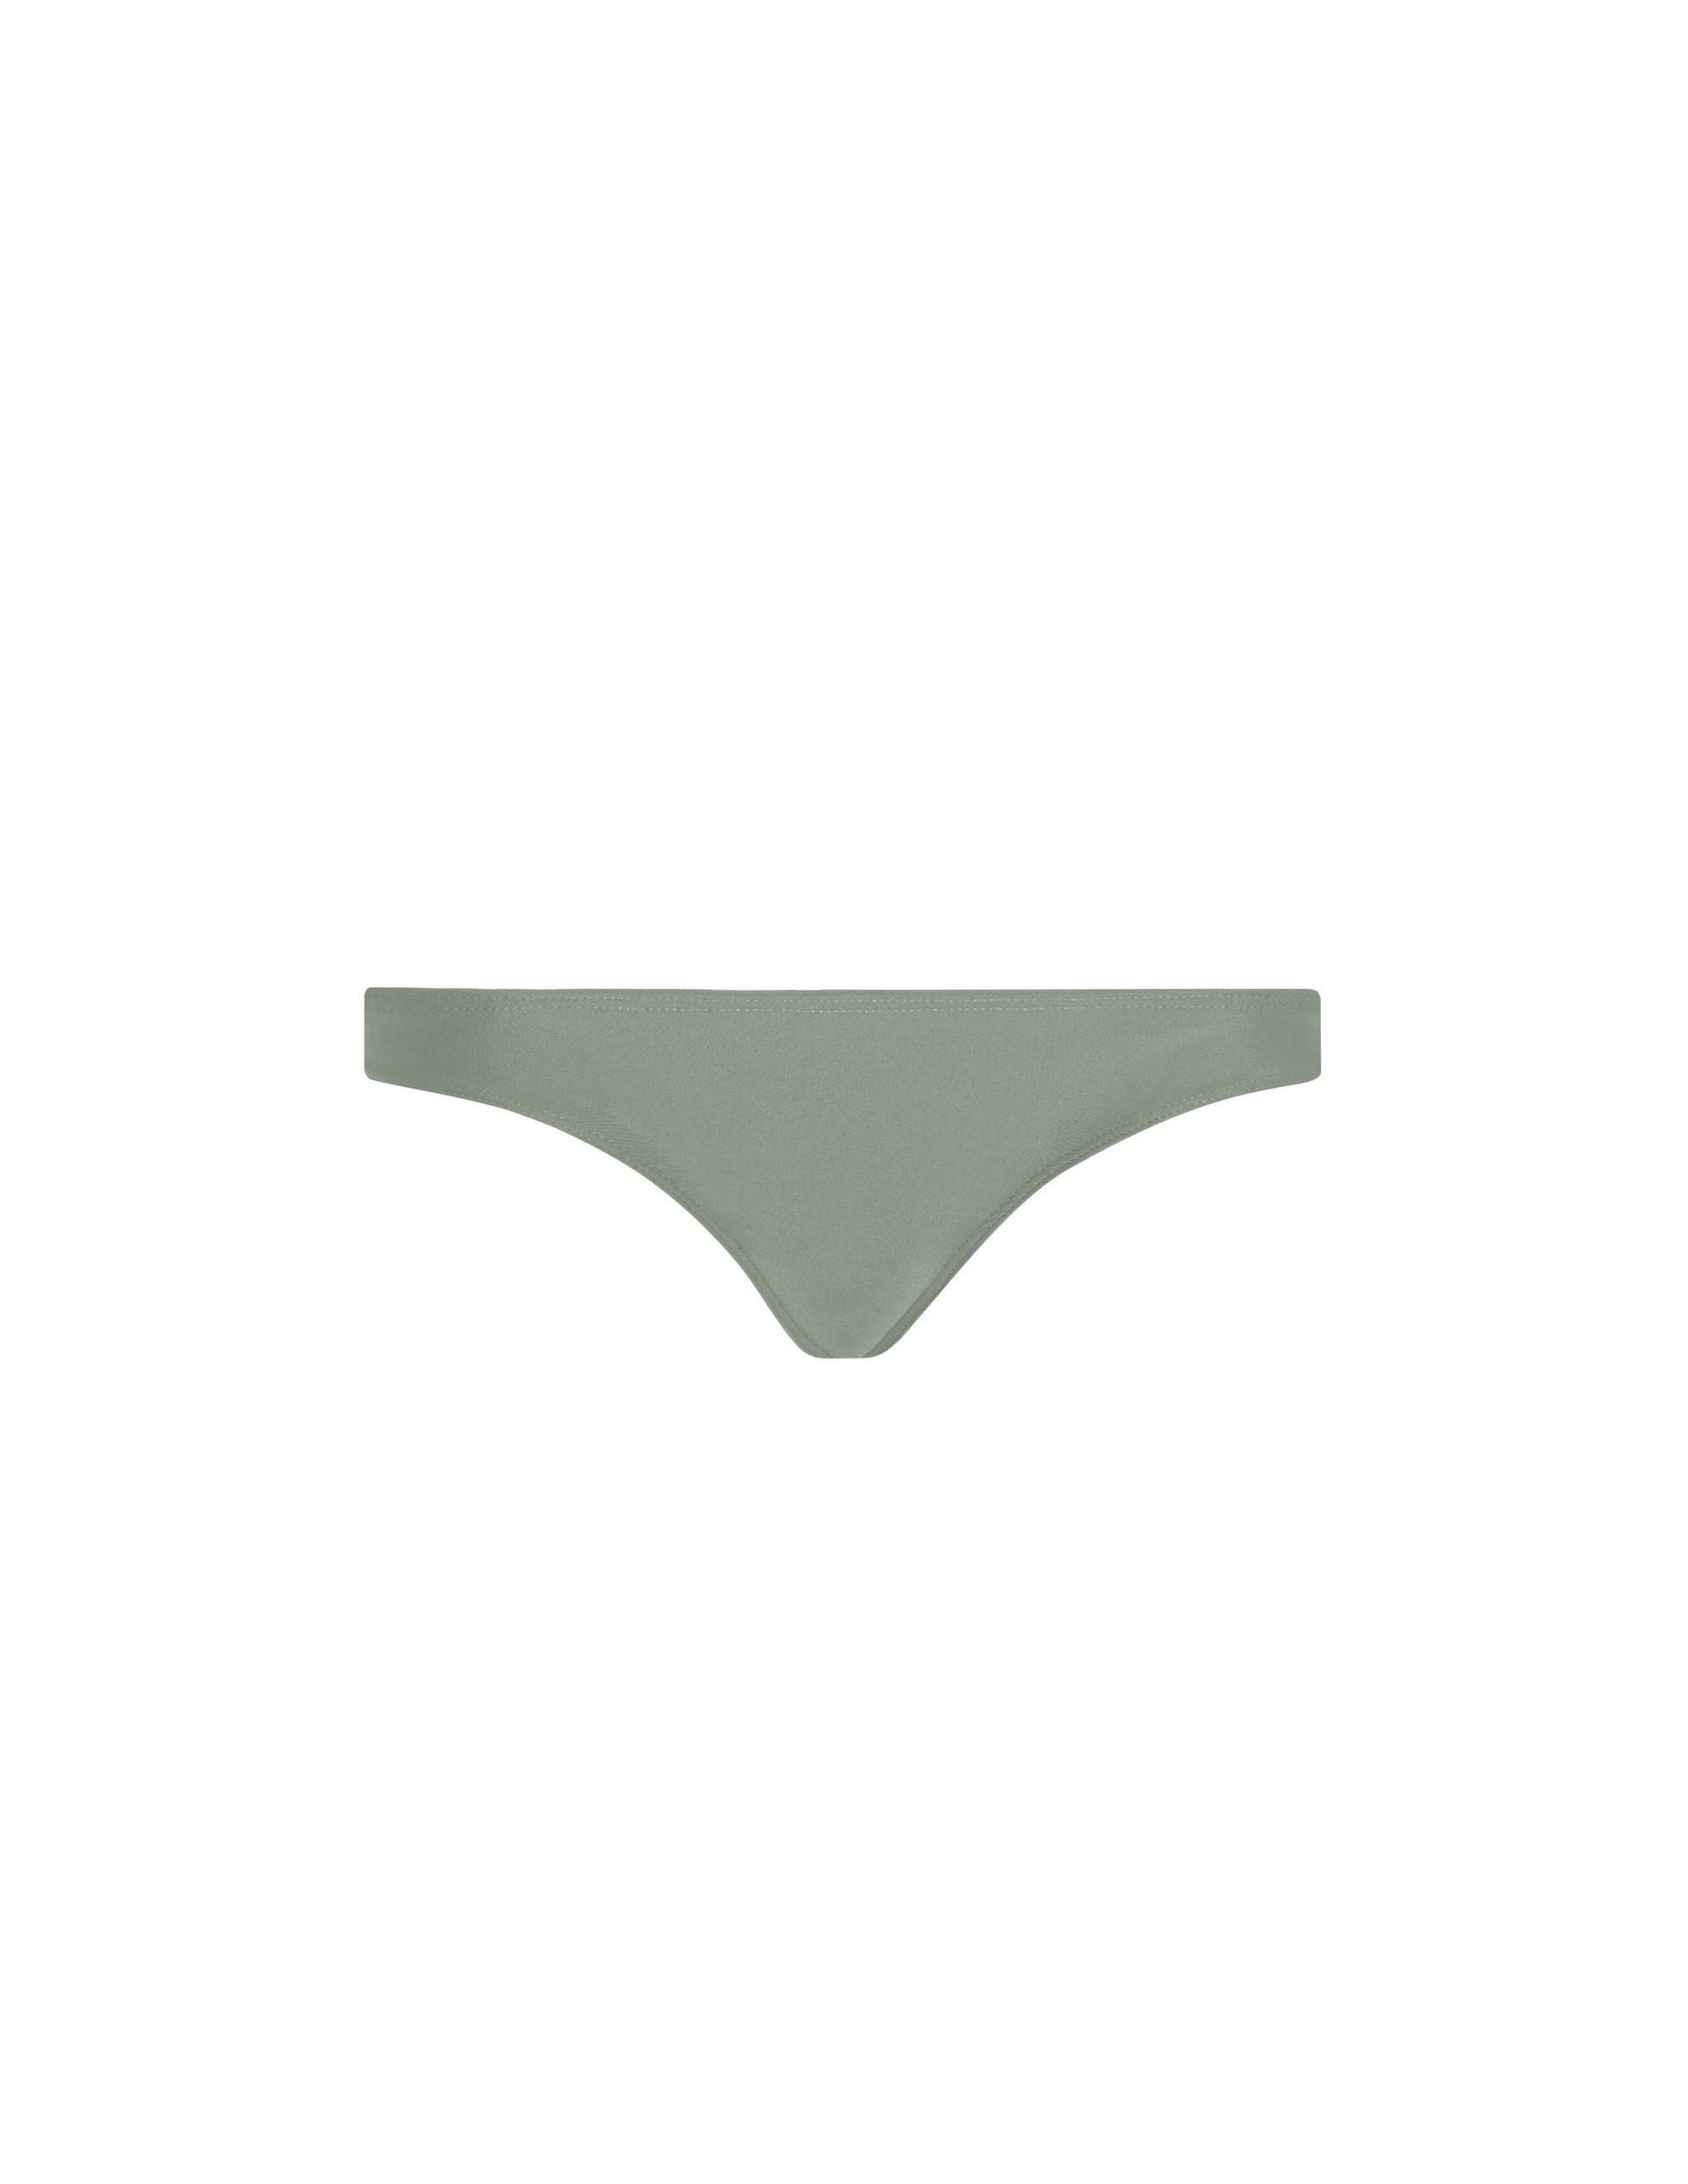 PARAISO bikini bottom - SERENGETI